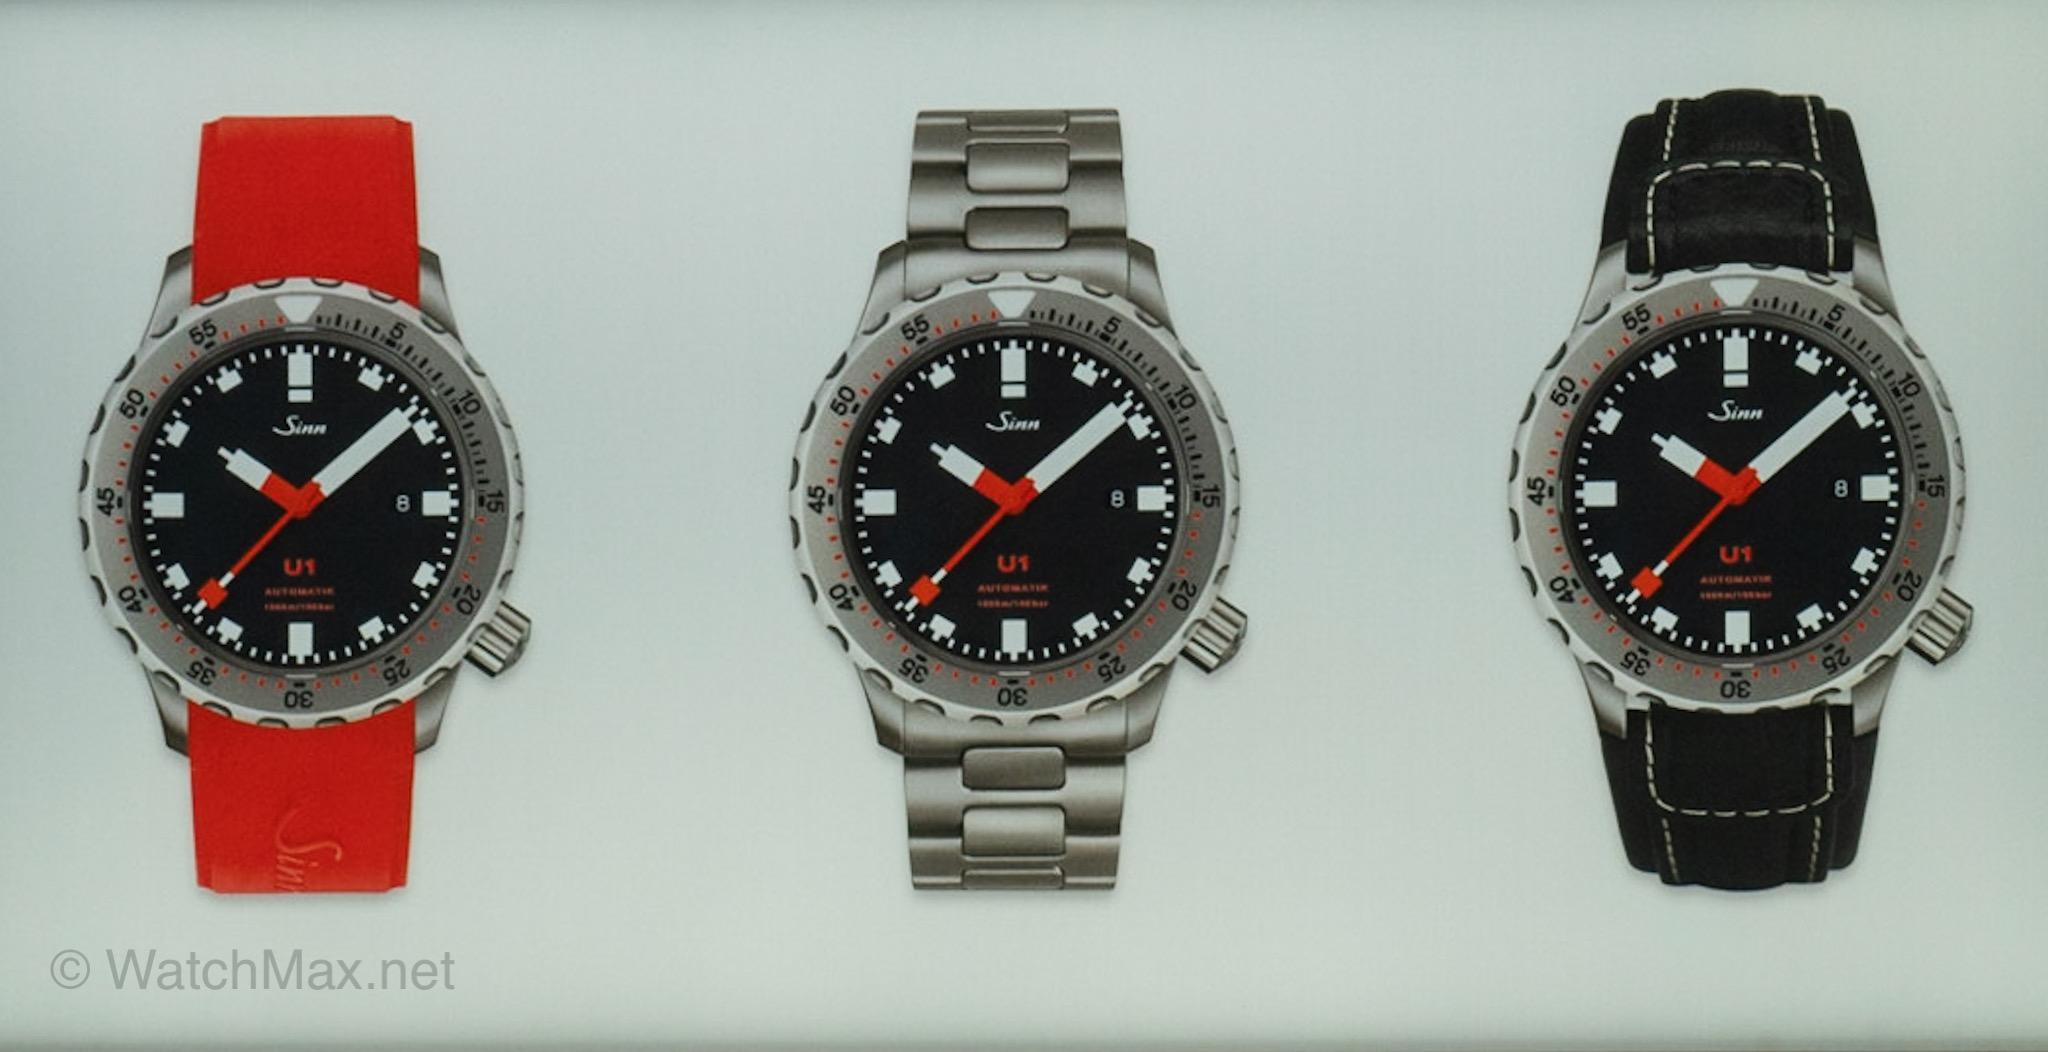 Sinn U1 with various straps / bracelet options